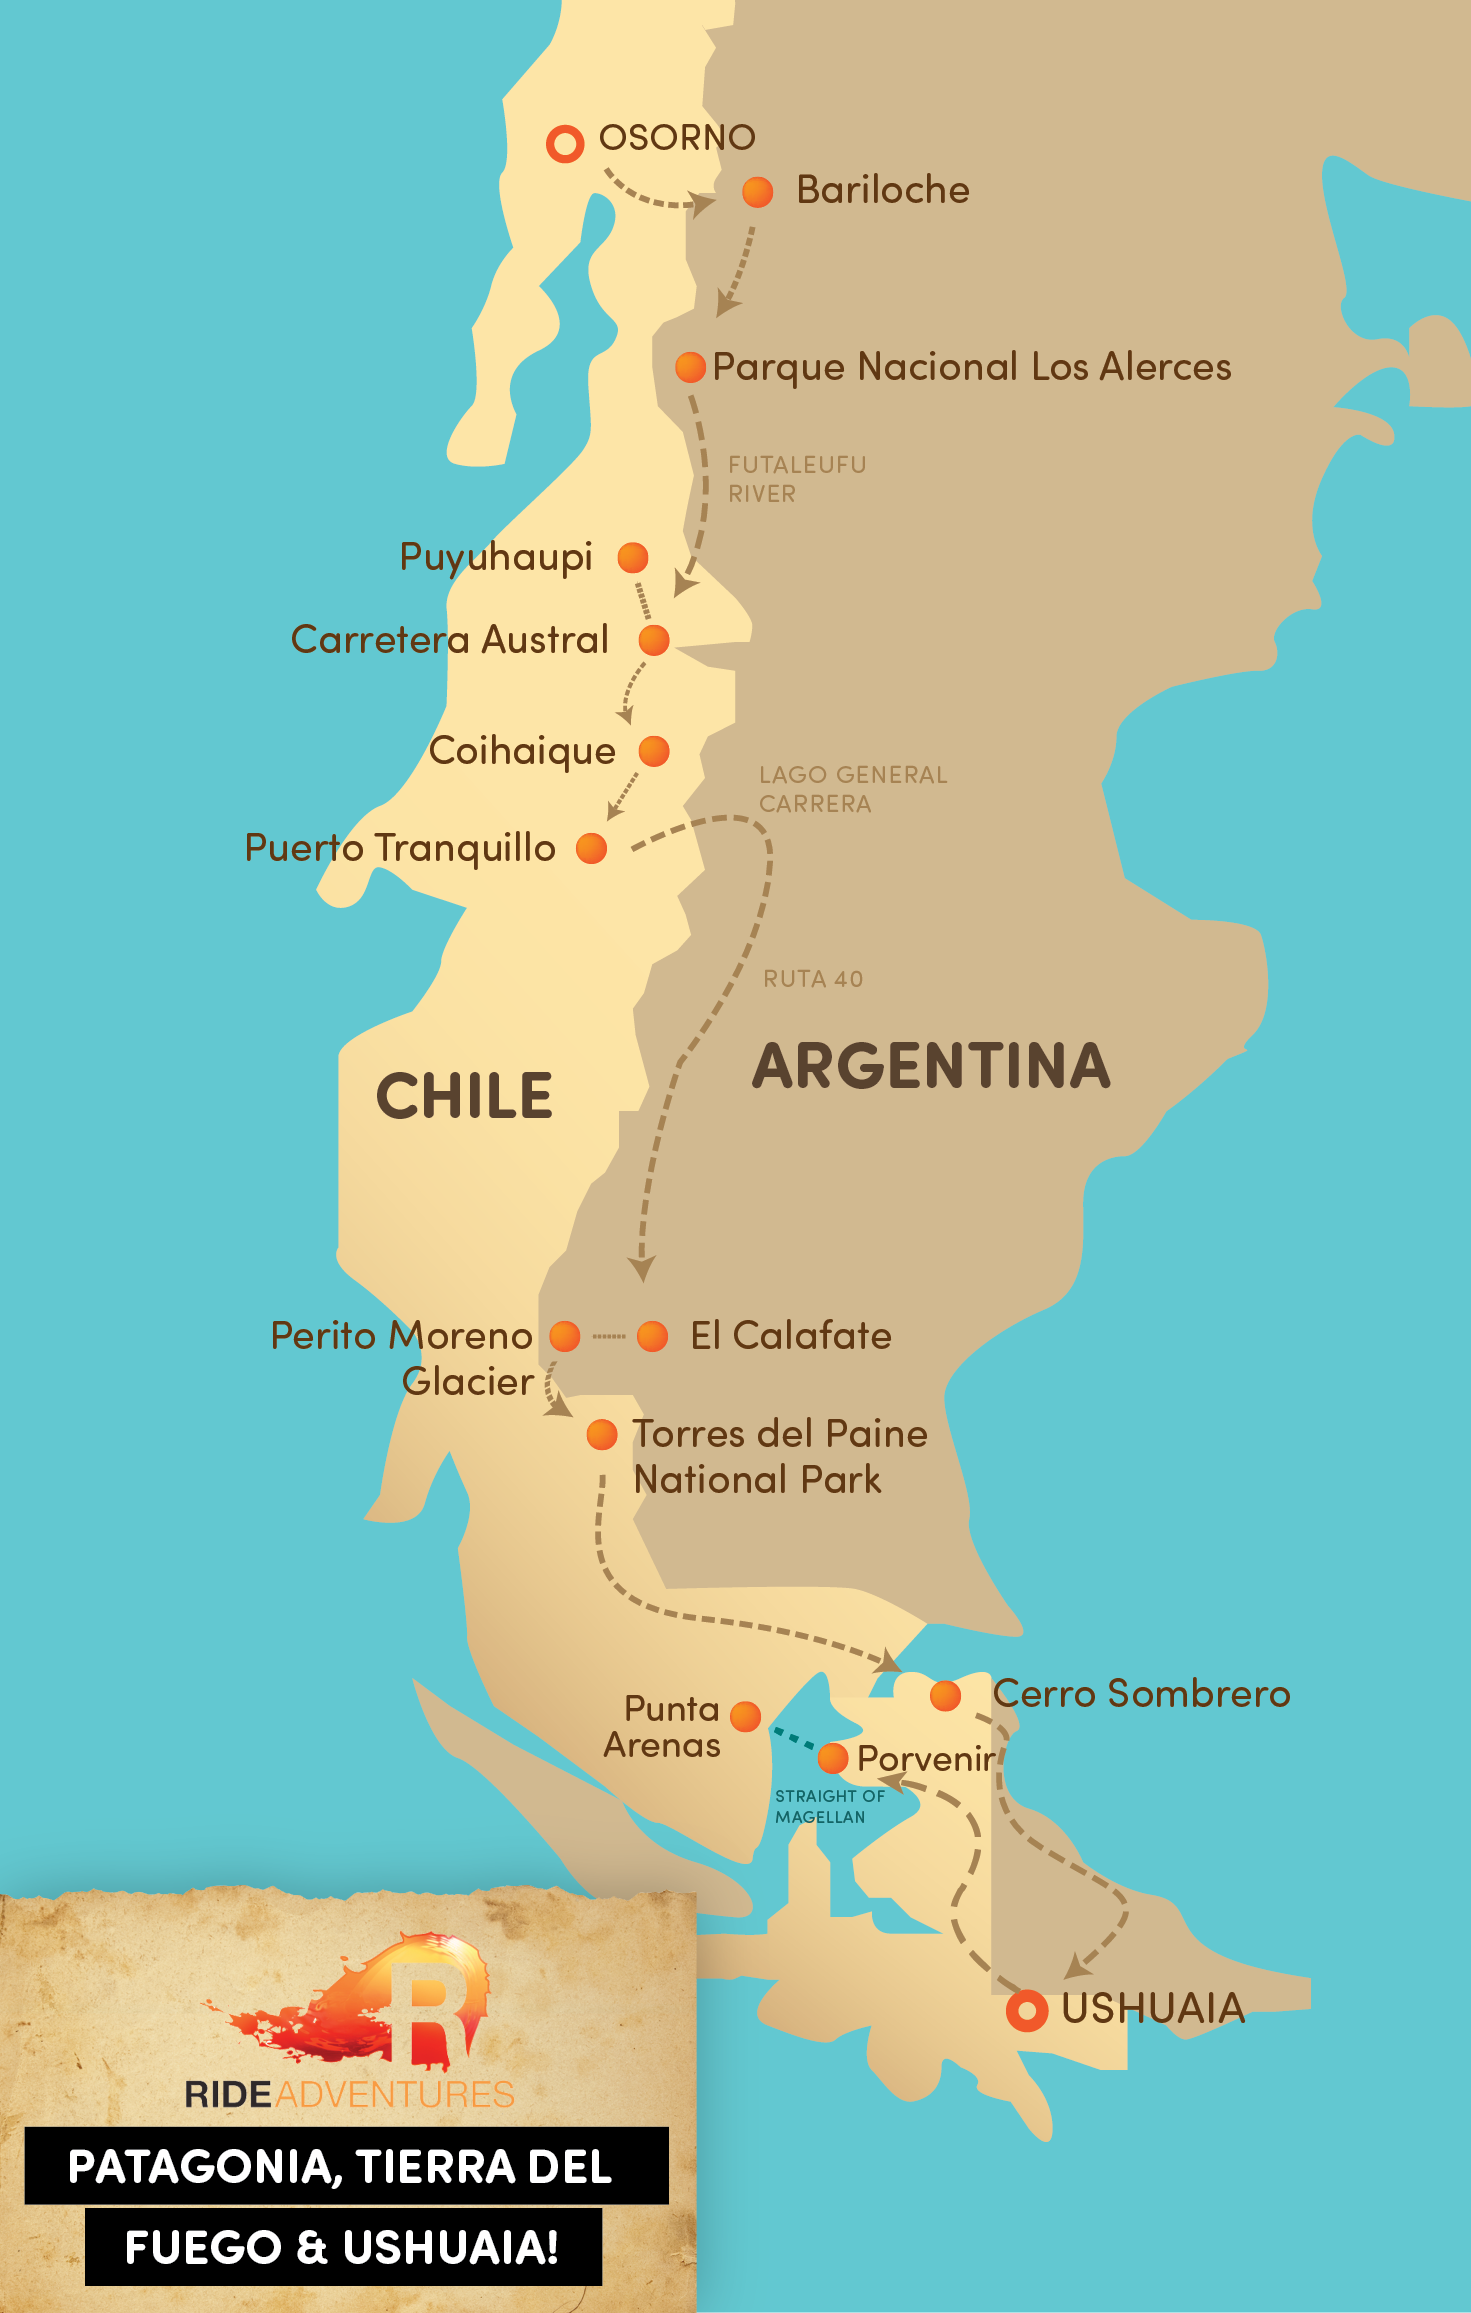 Patagonia Map for Motorcycle Trip